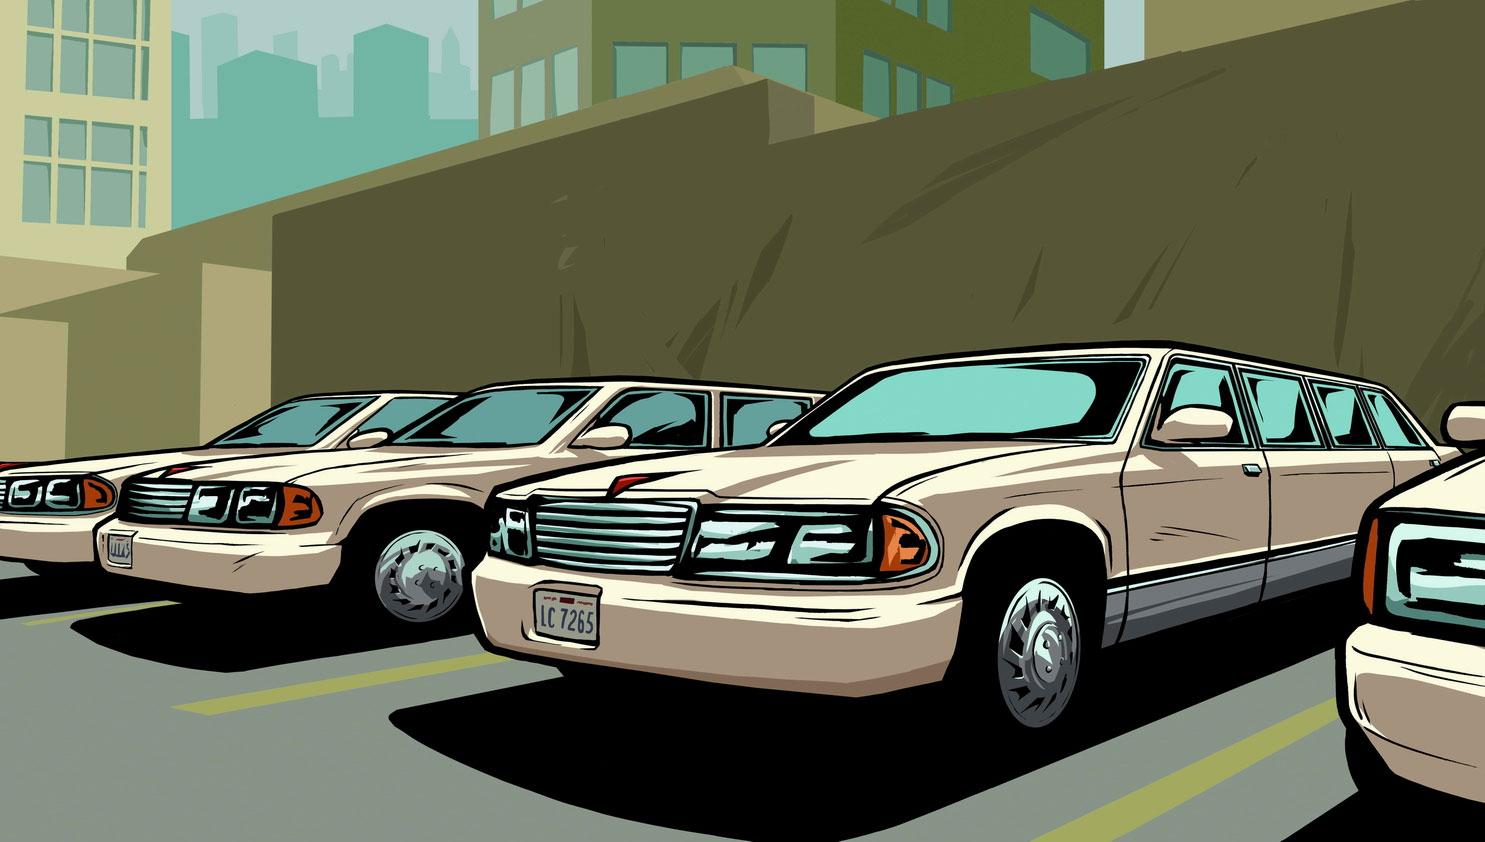 Gta V Car Wallpaper Liberty City Stories Artwork Gallery